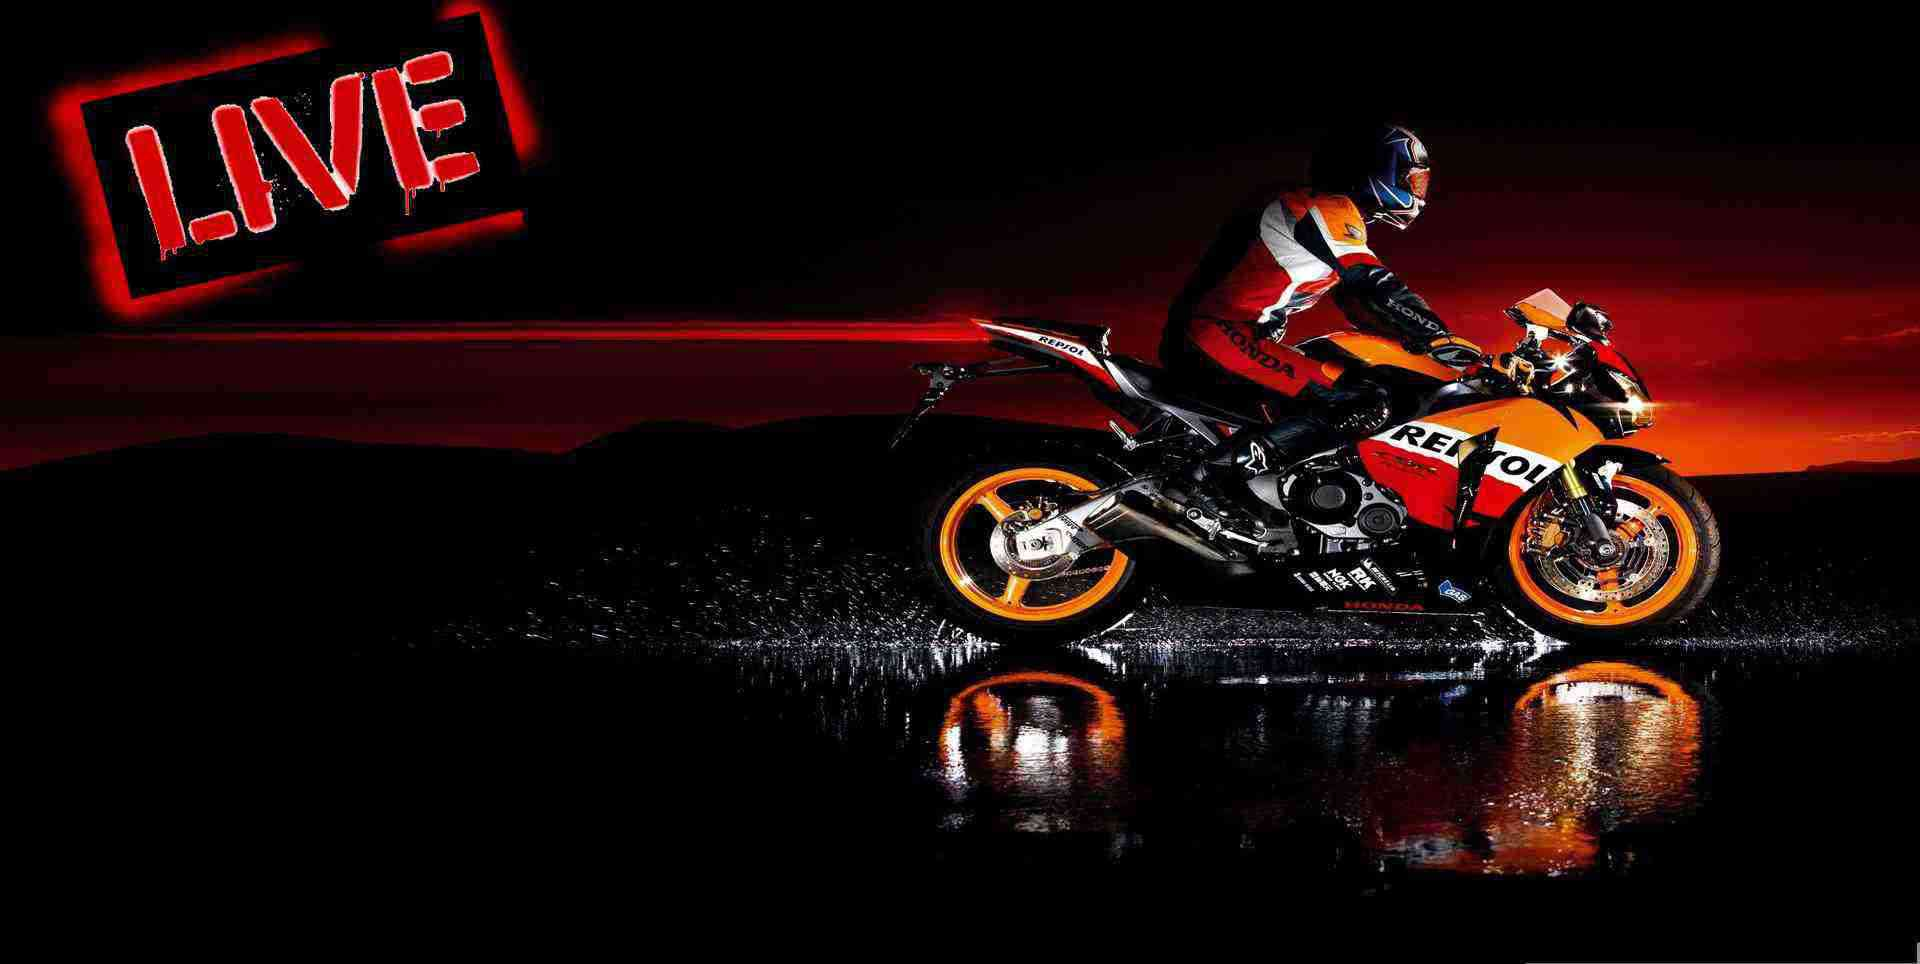 Sepang SBK 2015 Race Live